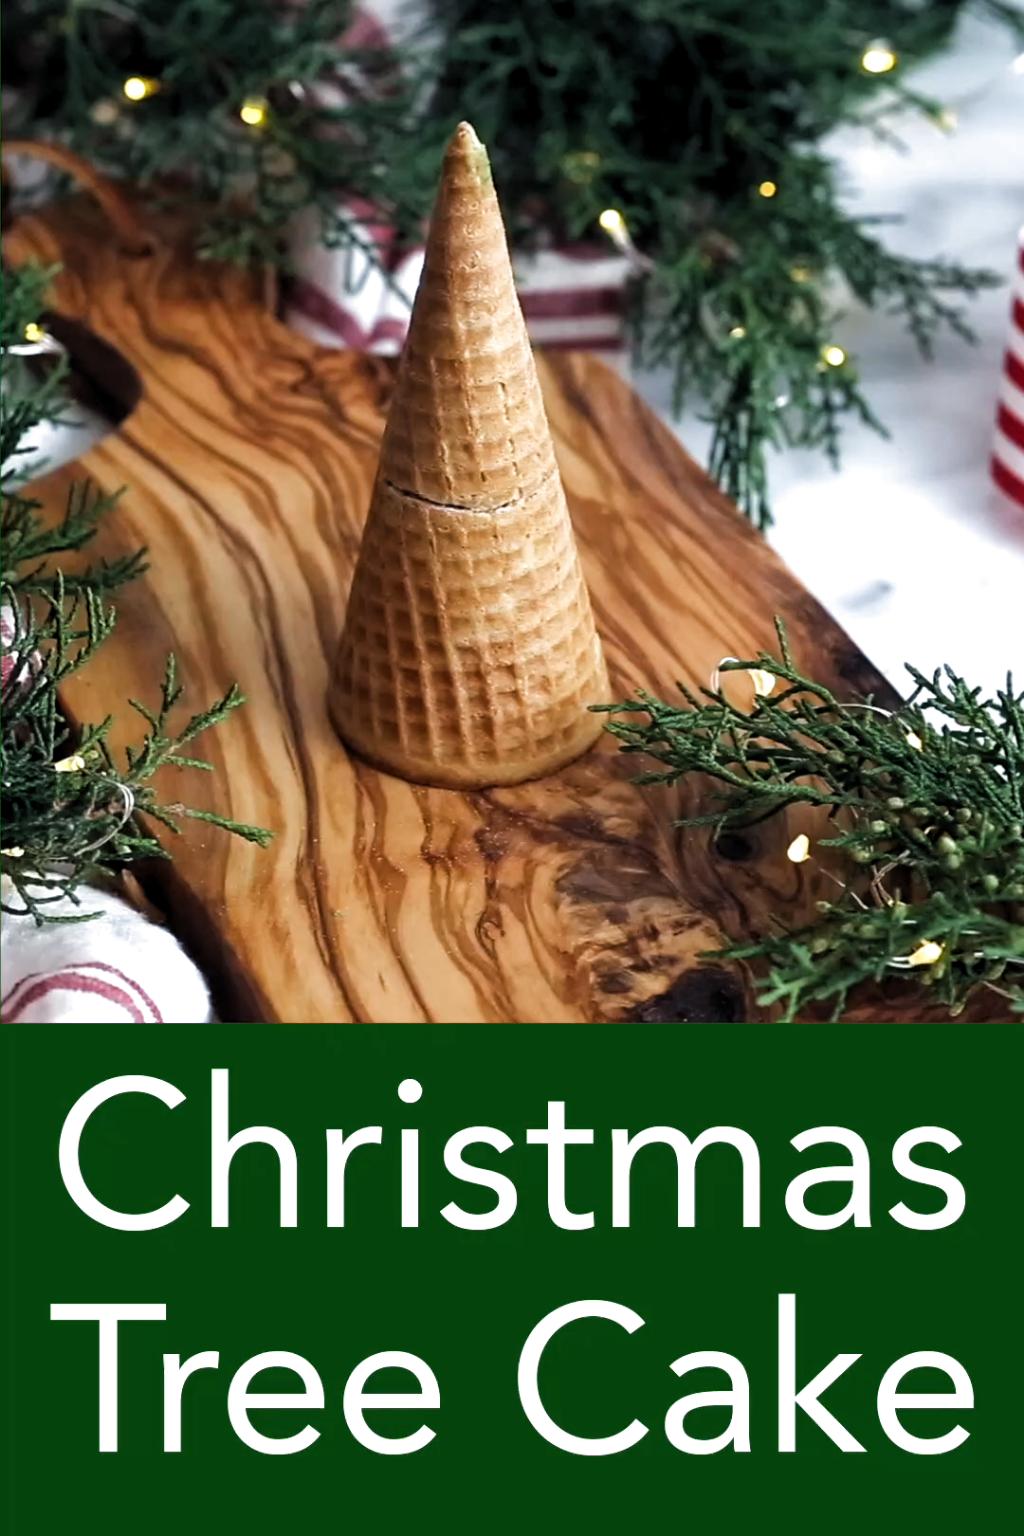 #ChristmasDesserts #ChristmasCakes    #ChristmasRecipes   #ChristmasCookies #ChristmasPudding #ChristmasSnacks #ChristmasTreats #ChristmasAppetizers